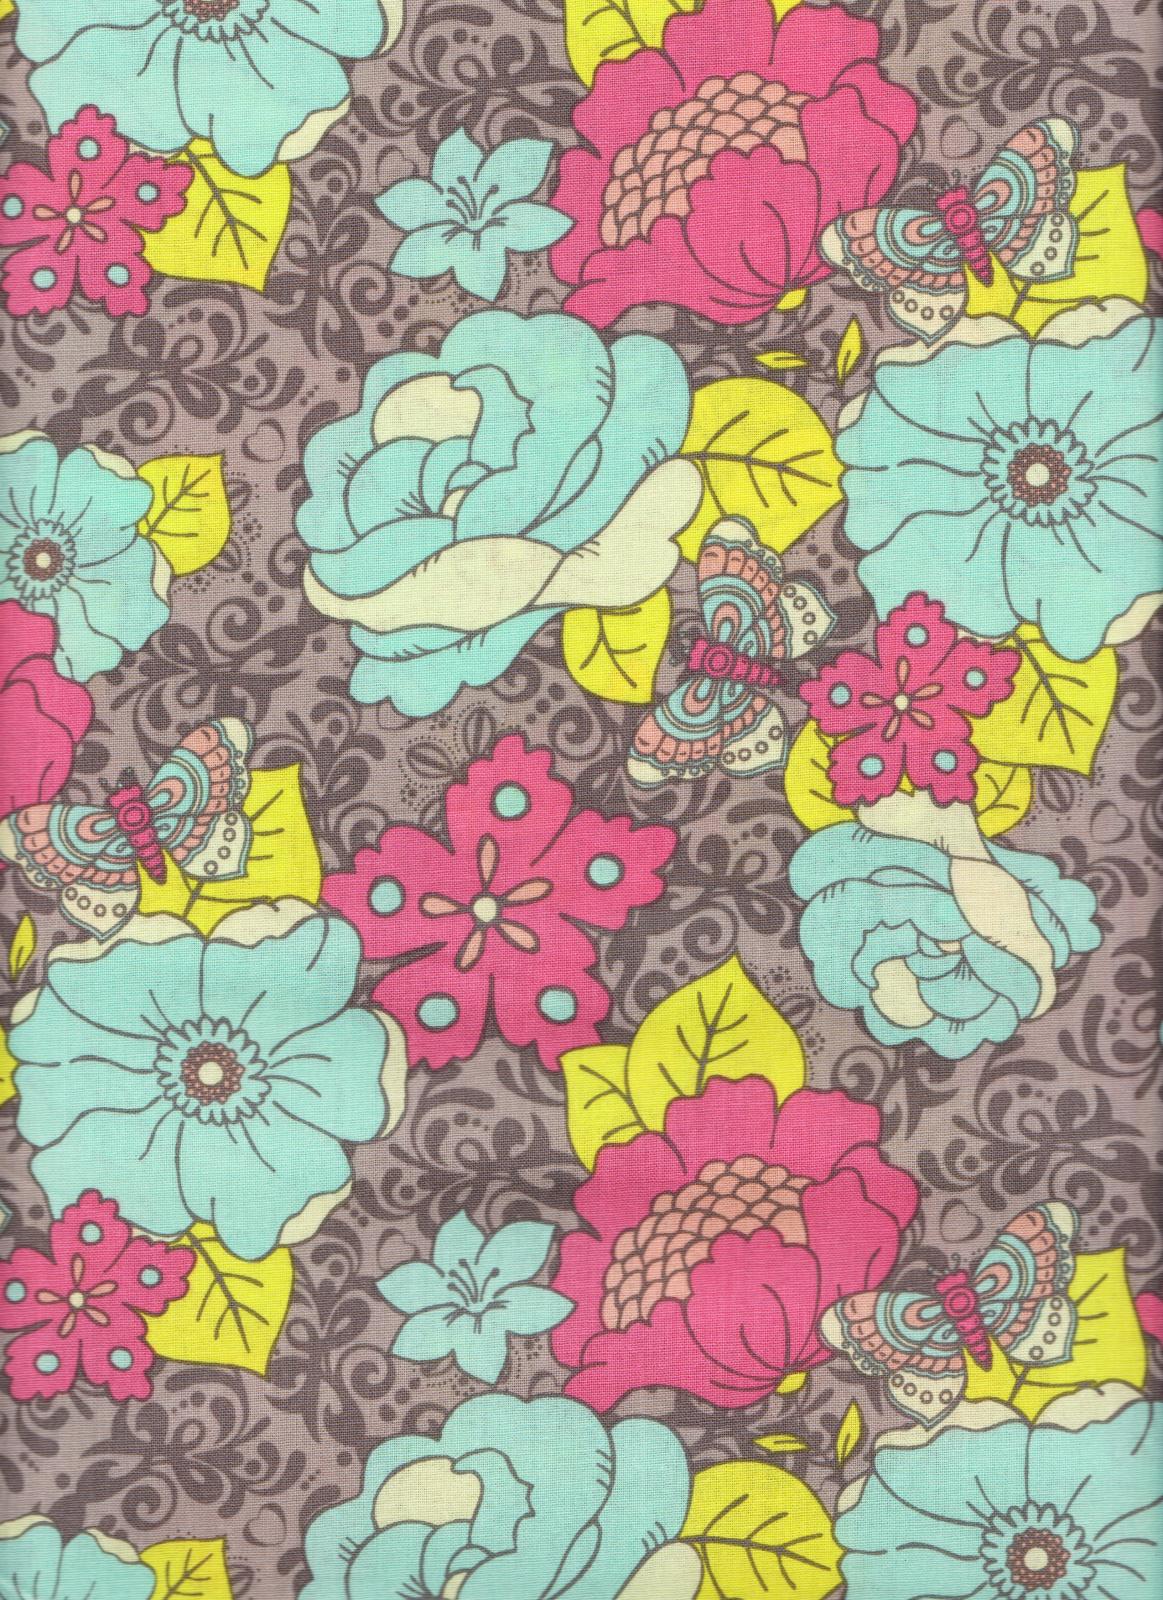 PROMO* CF-Mint Condition 2140701WM-01 Multi - Floral